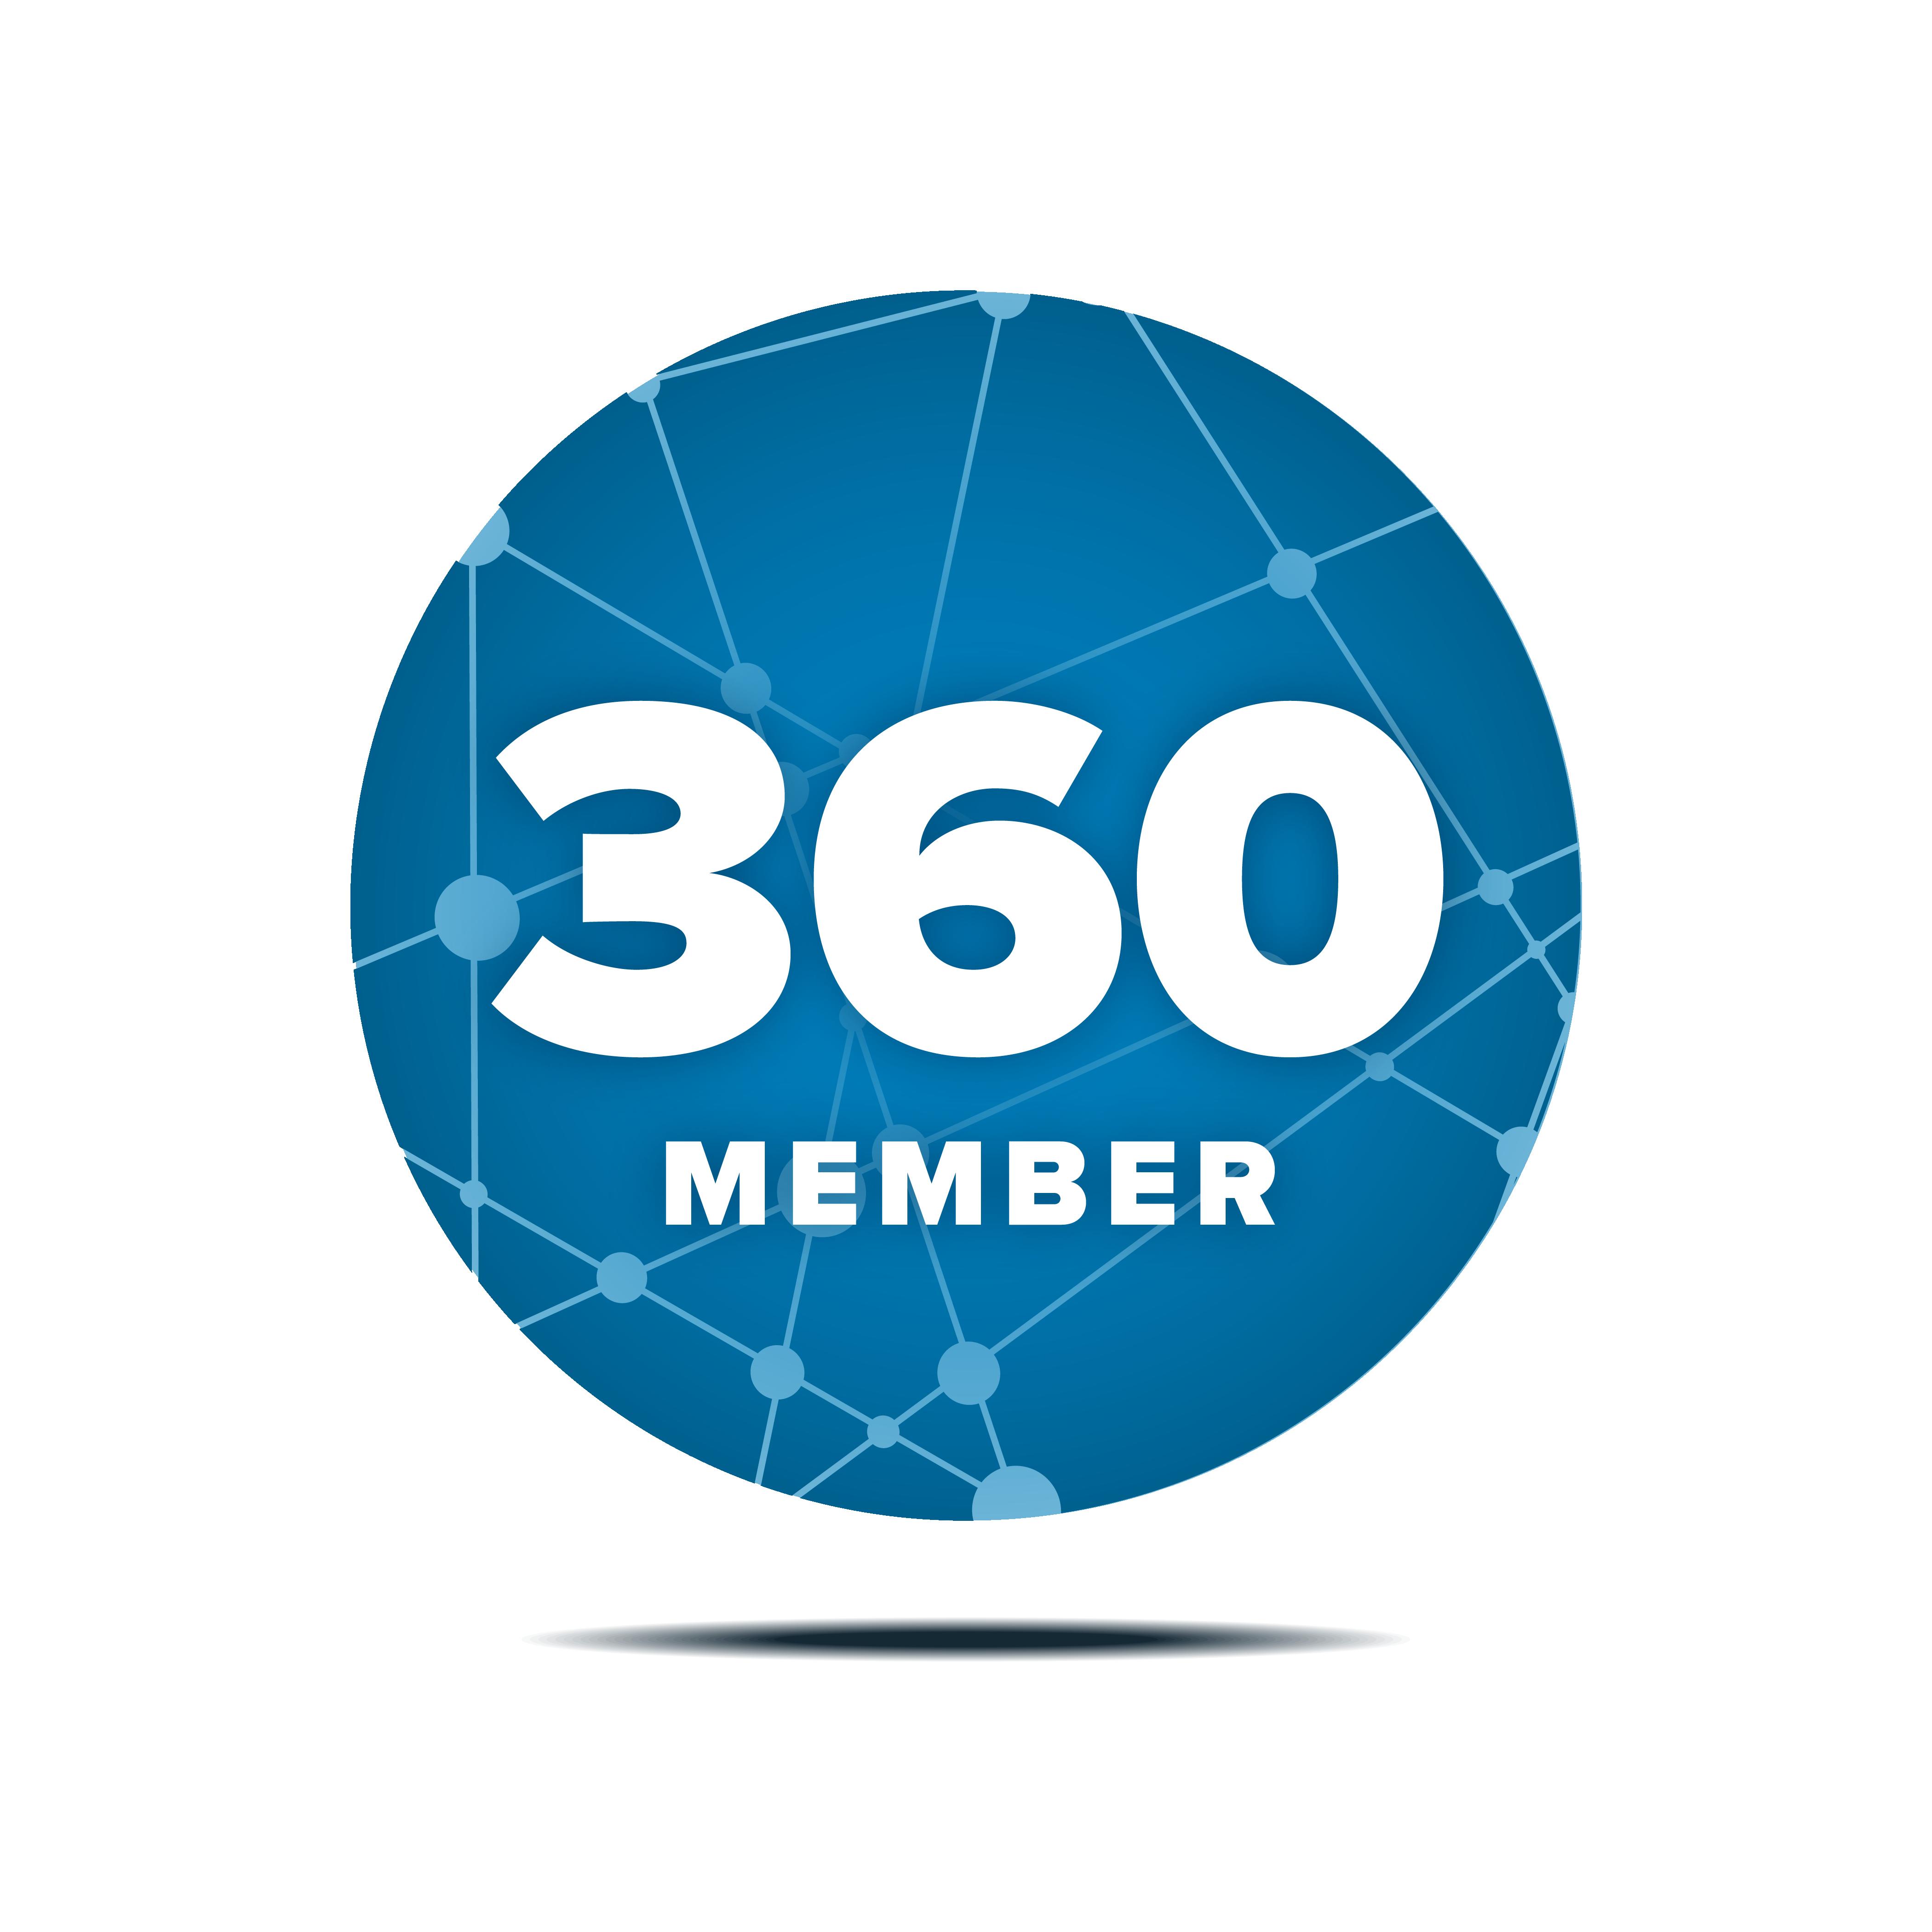 360 Member logo